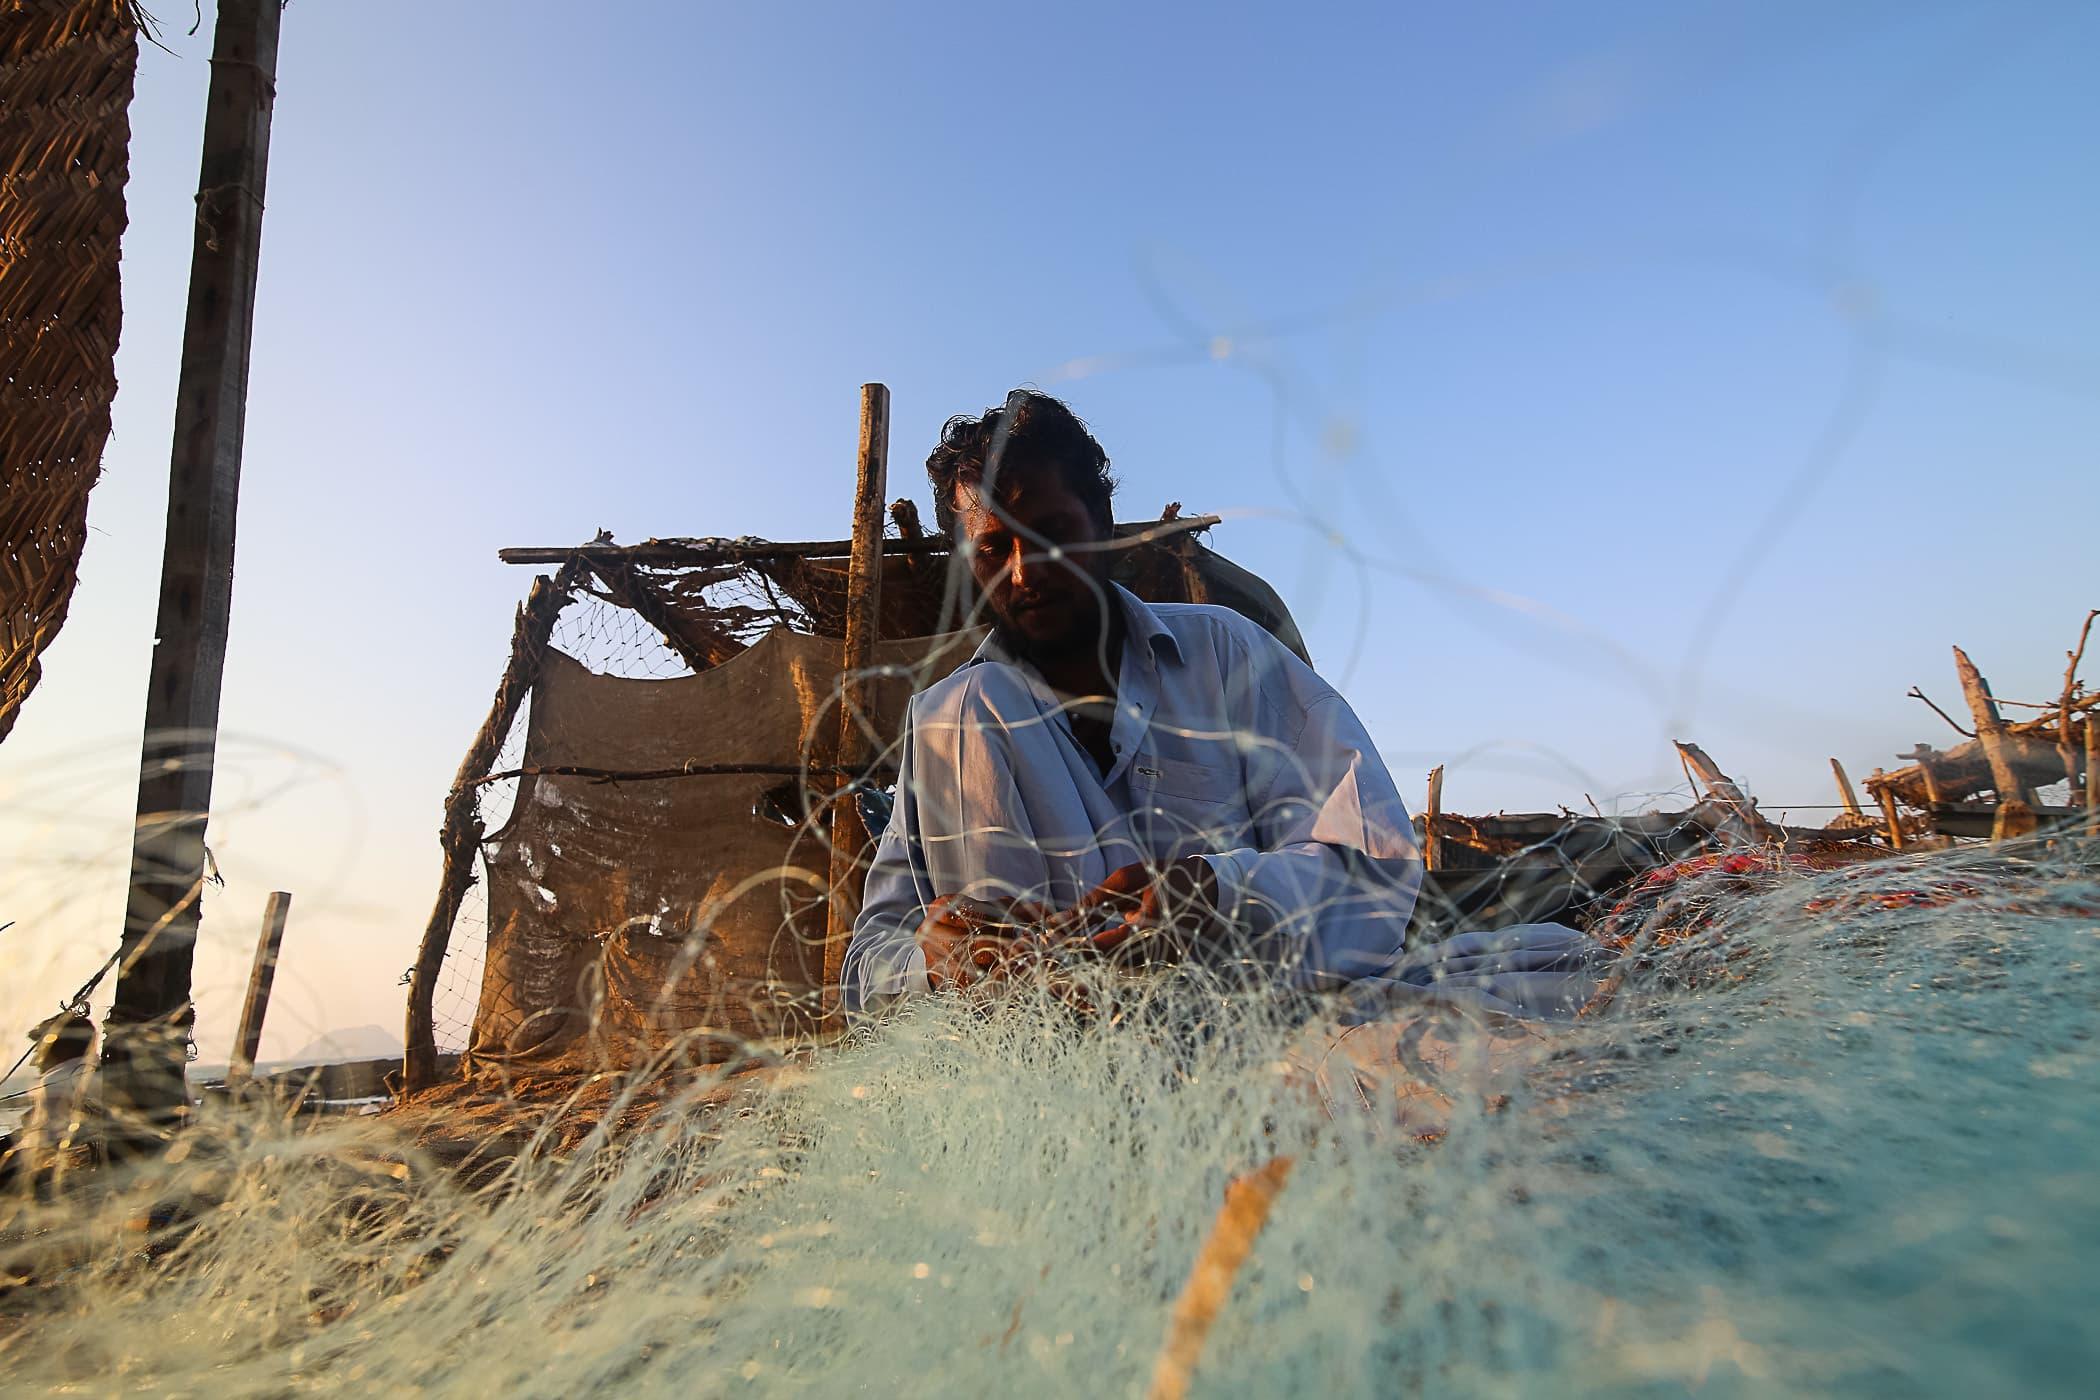 Qasim fixes a new net on the beach at Mubarak Village.